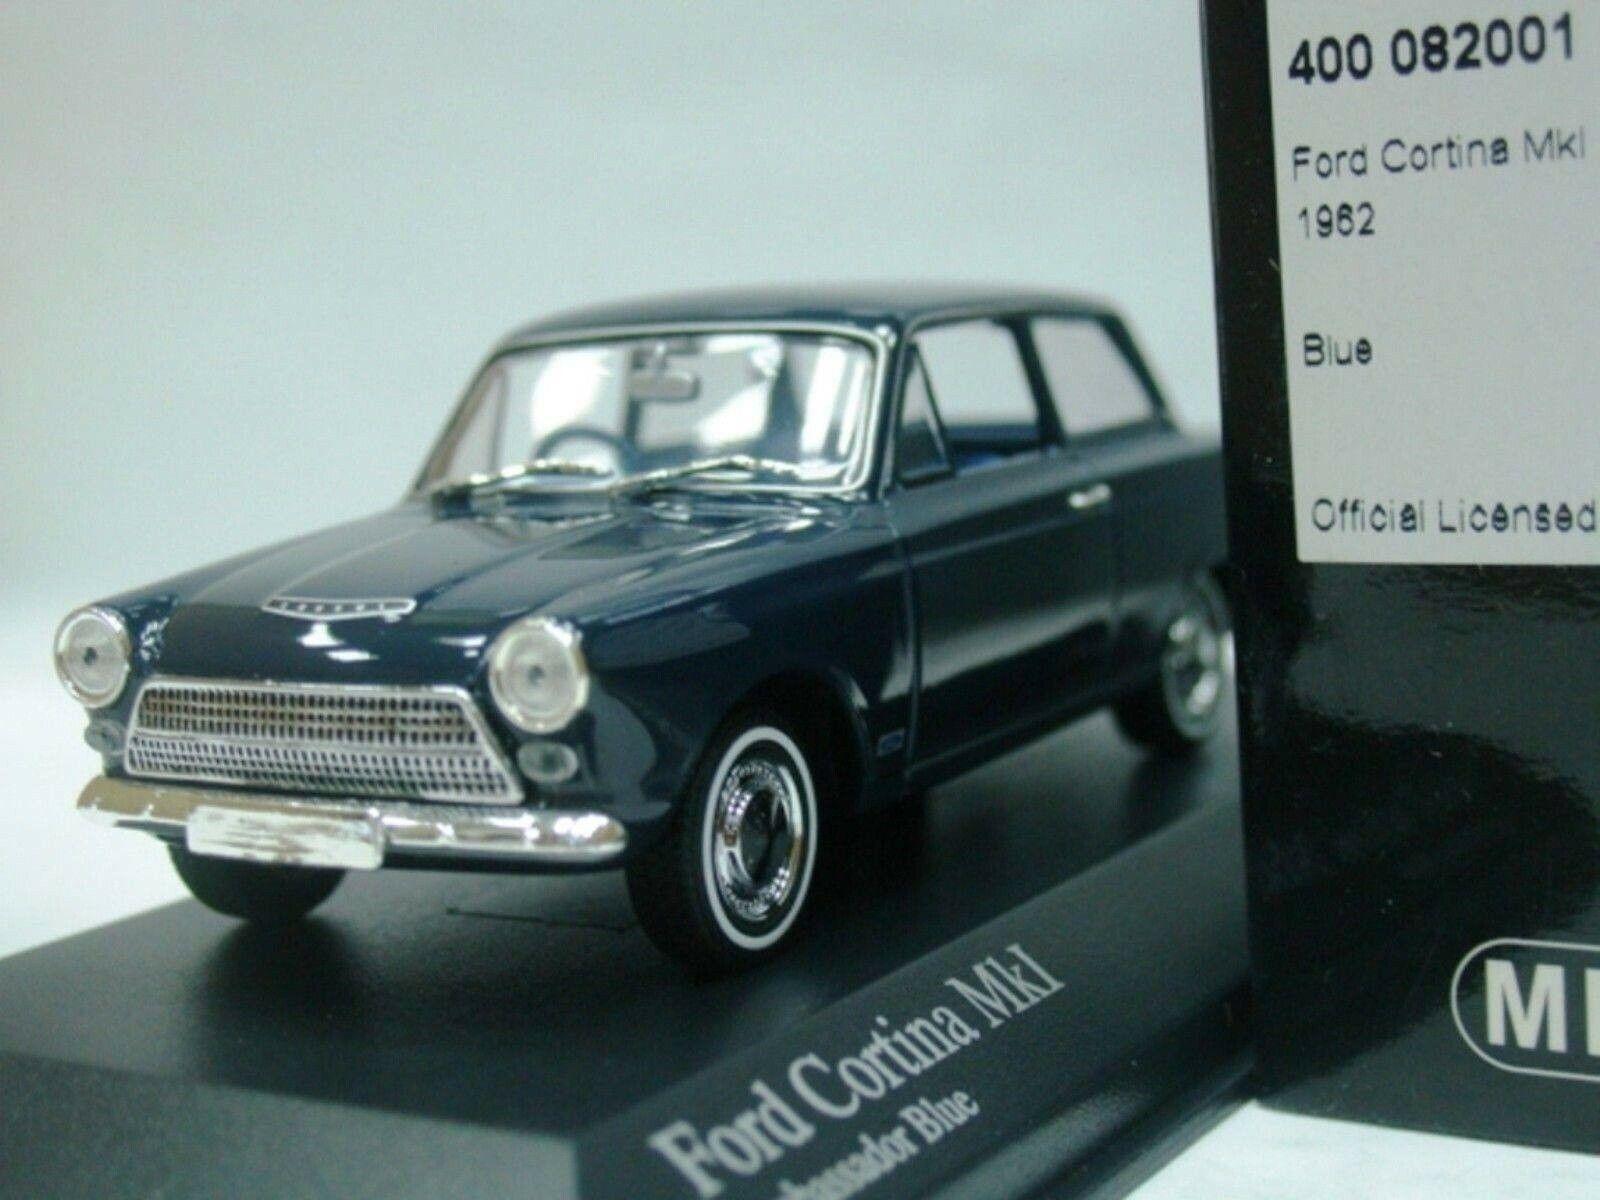 Wow extremadonnate raro Ford Cortina Mki 1962 Rhd blu Oscuro 1 43 Minichamps-gt Lotus